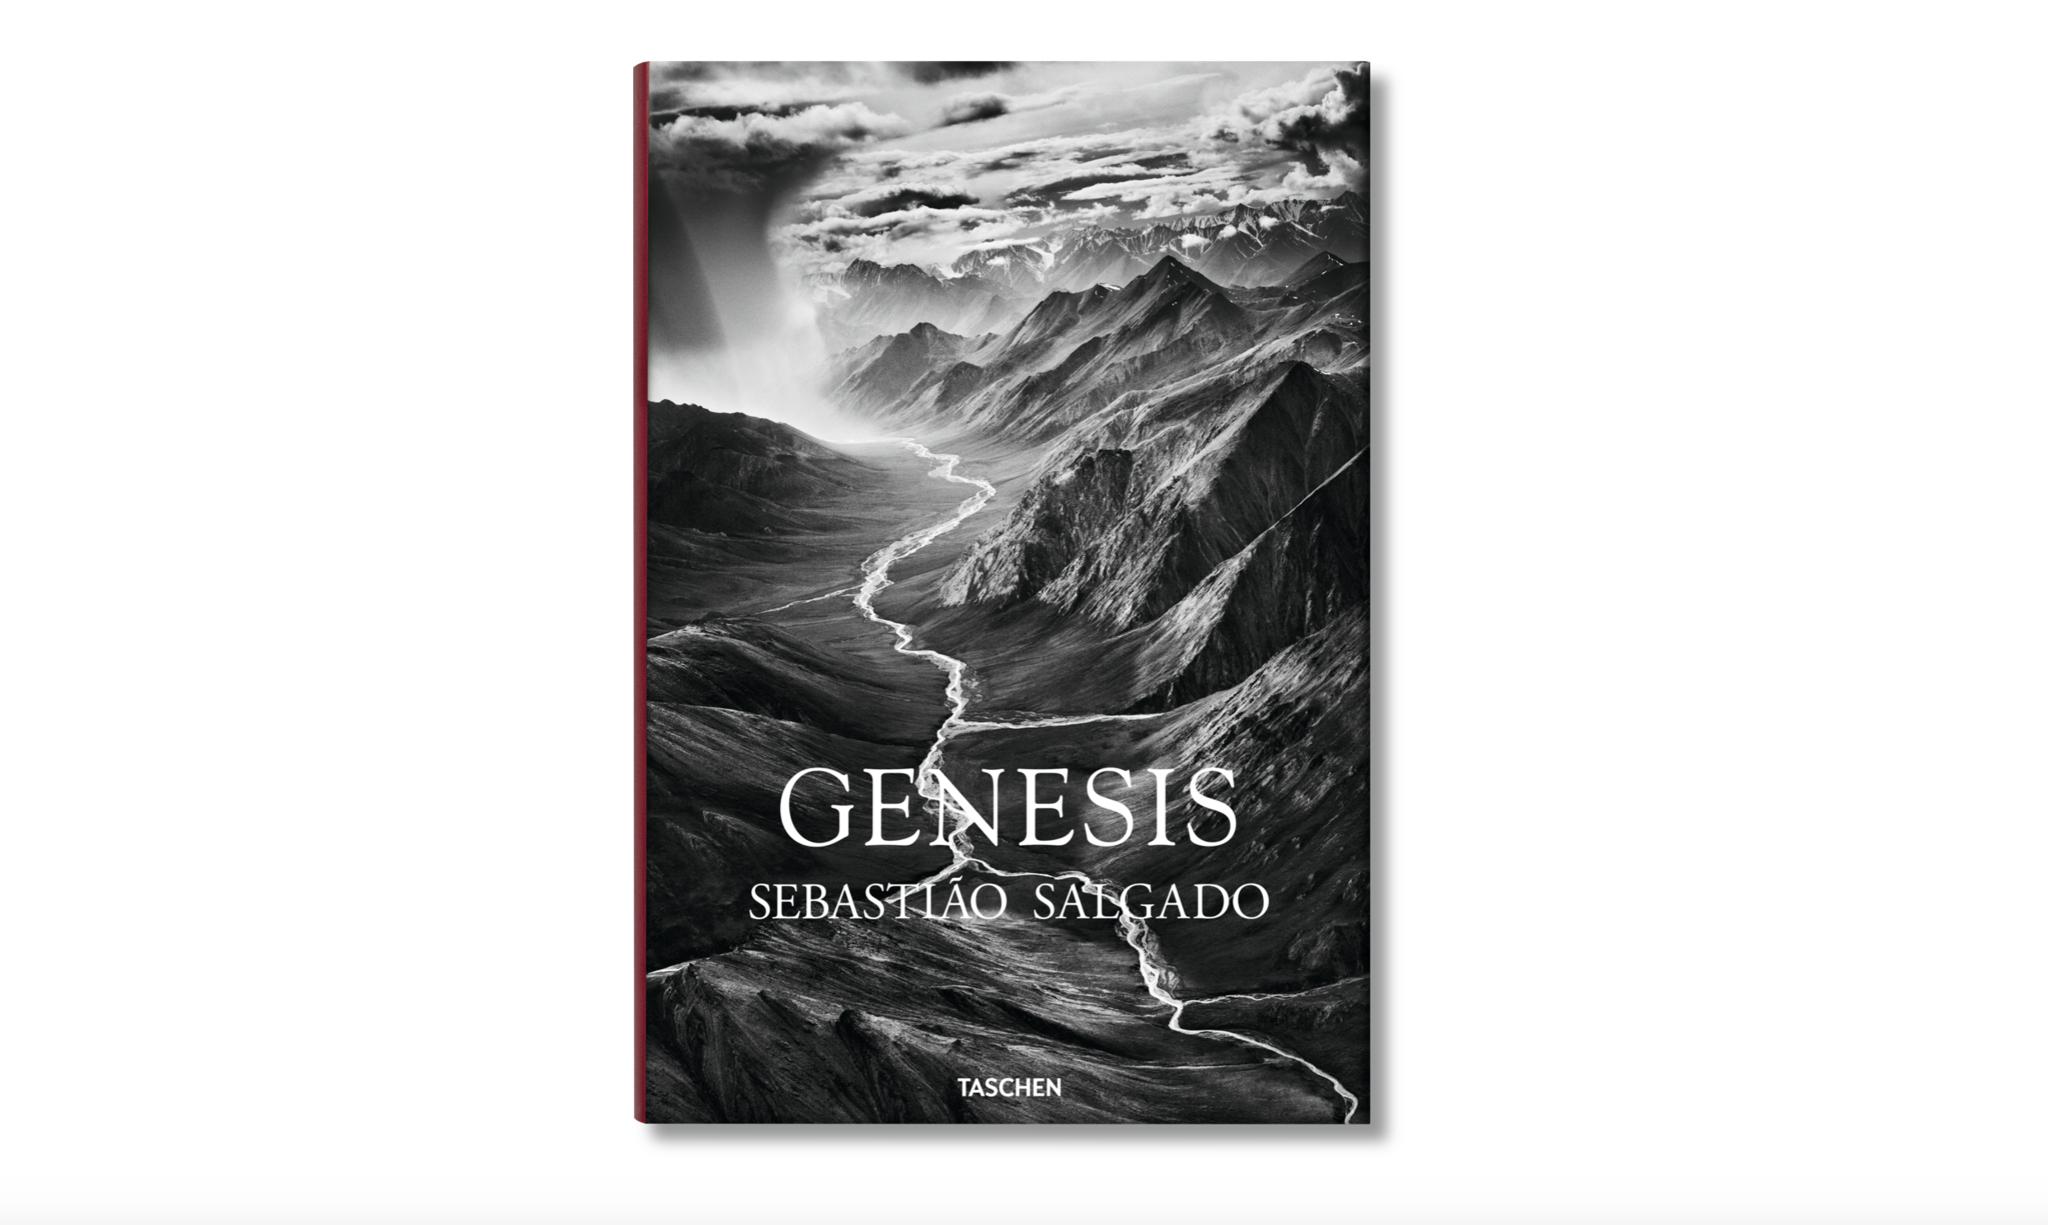 Taschen Salgado, Genesis